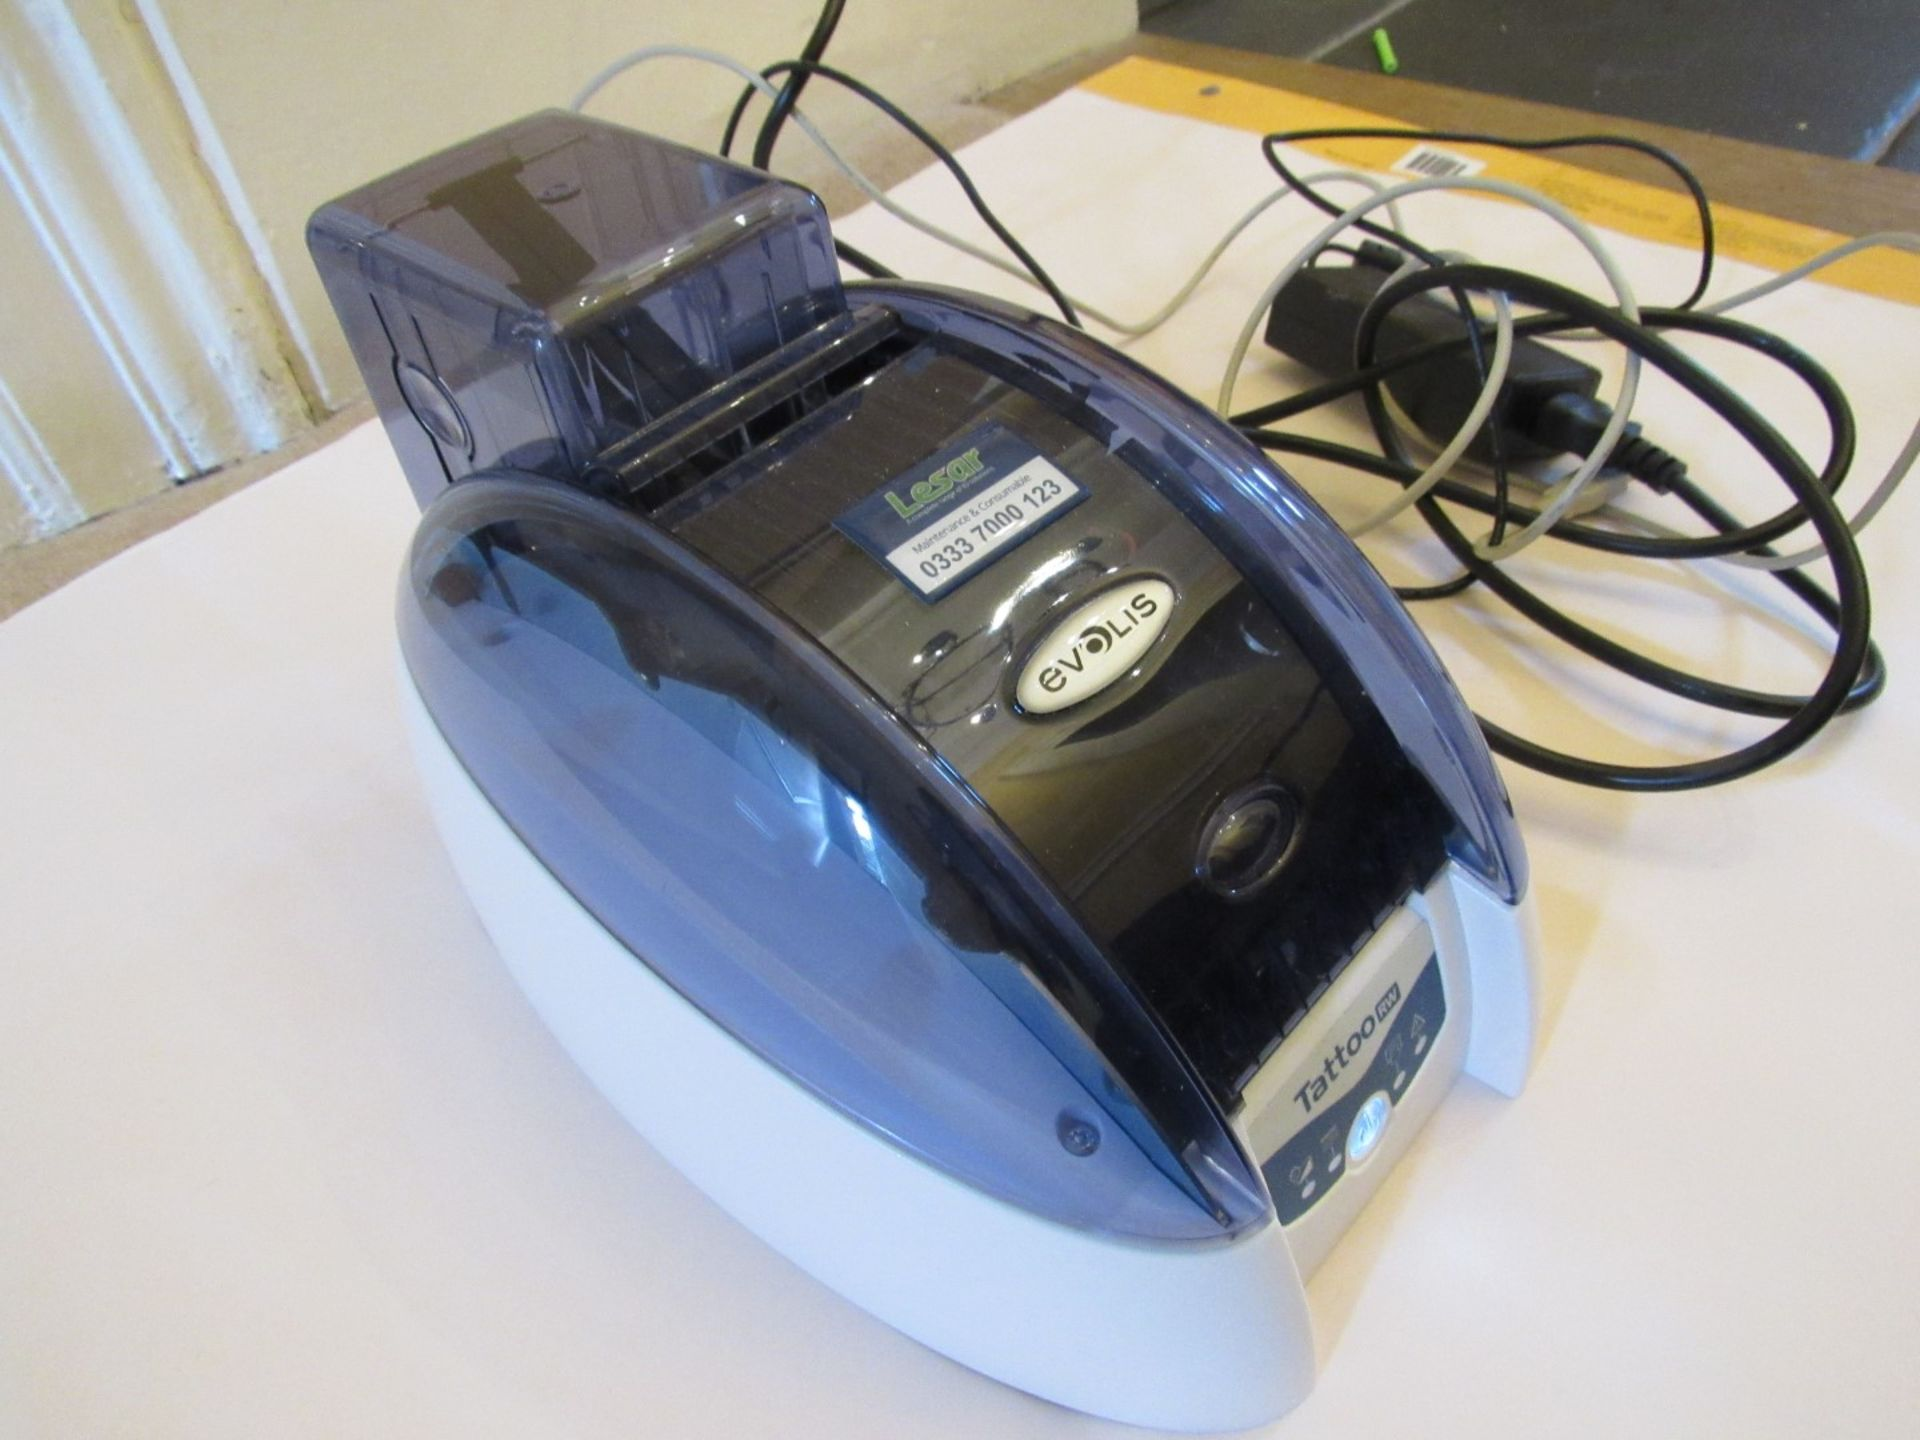 Evolis TTRW_V2 rewriteable ID Card printer (Locati - Image 6 of 8